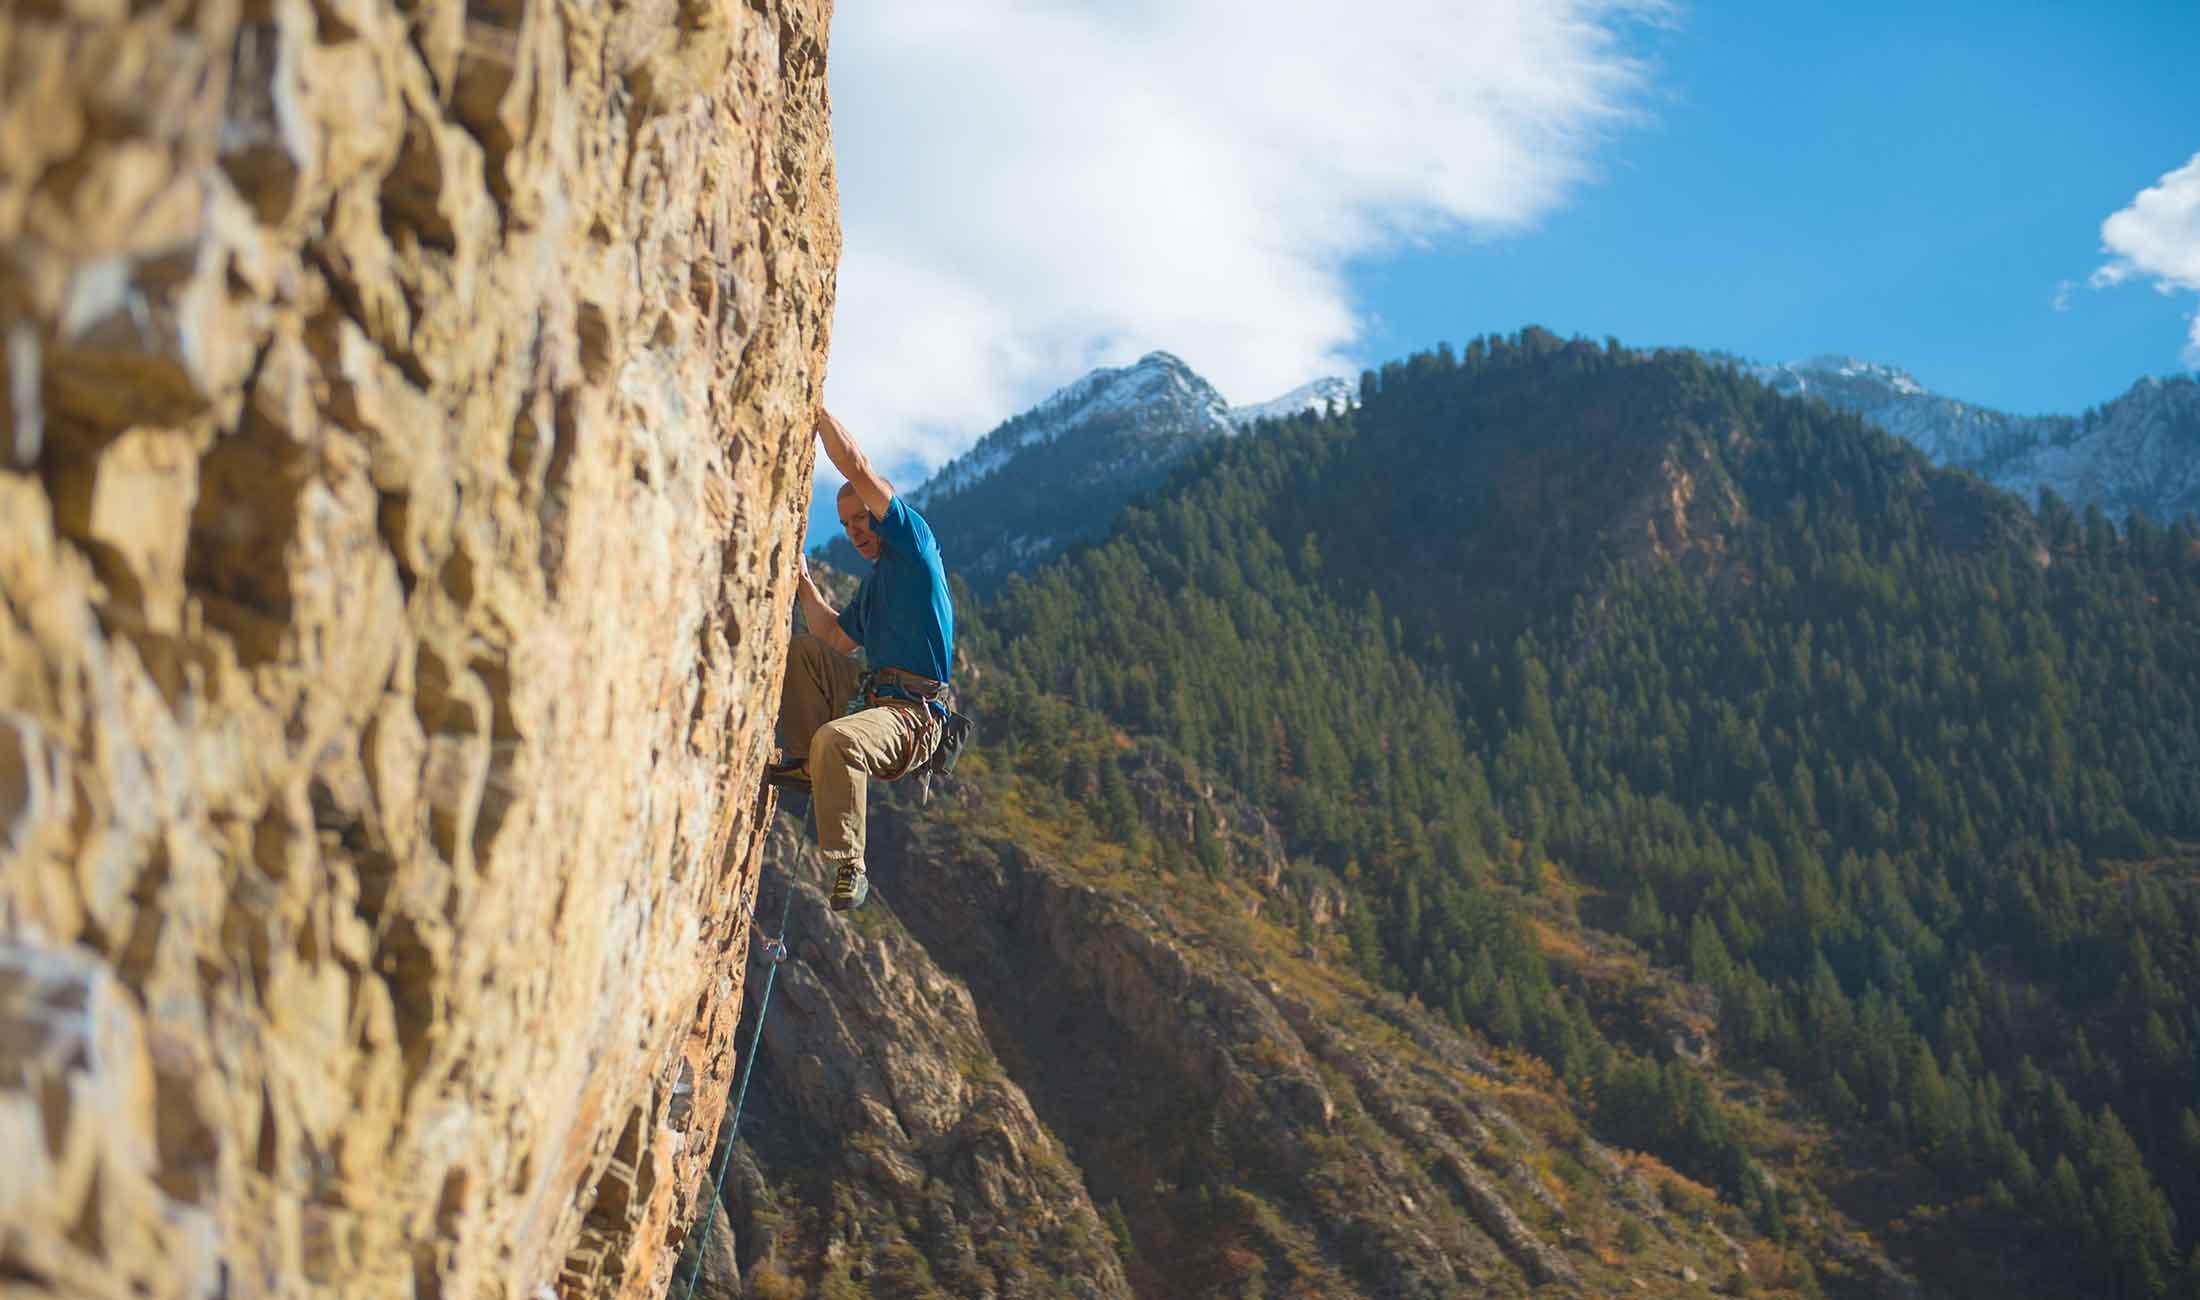 Big walls to bouldering, Utah's got it.